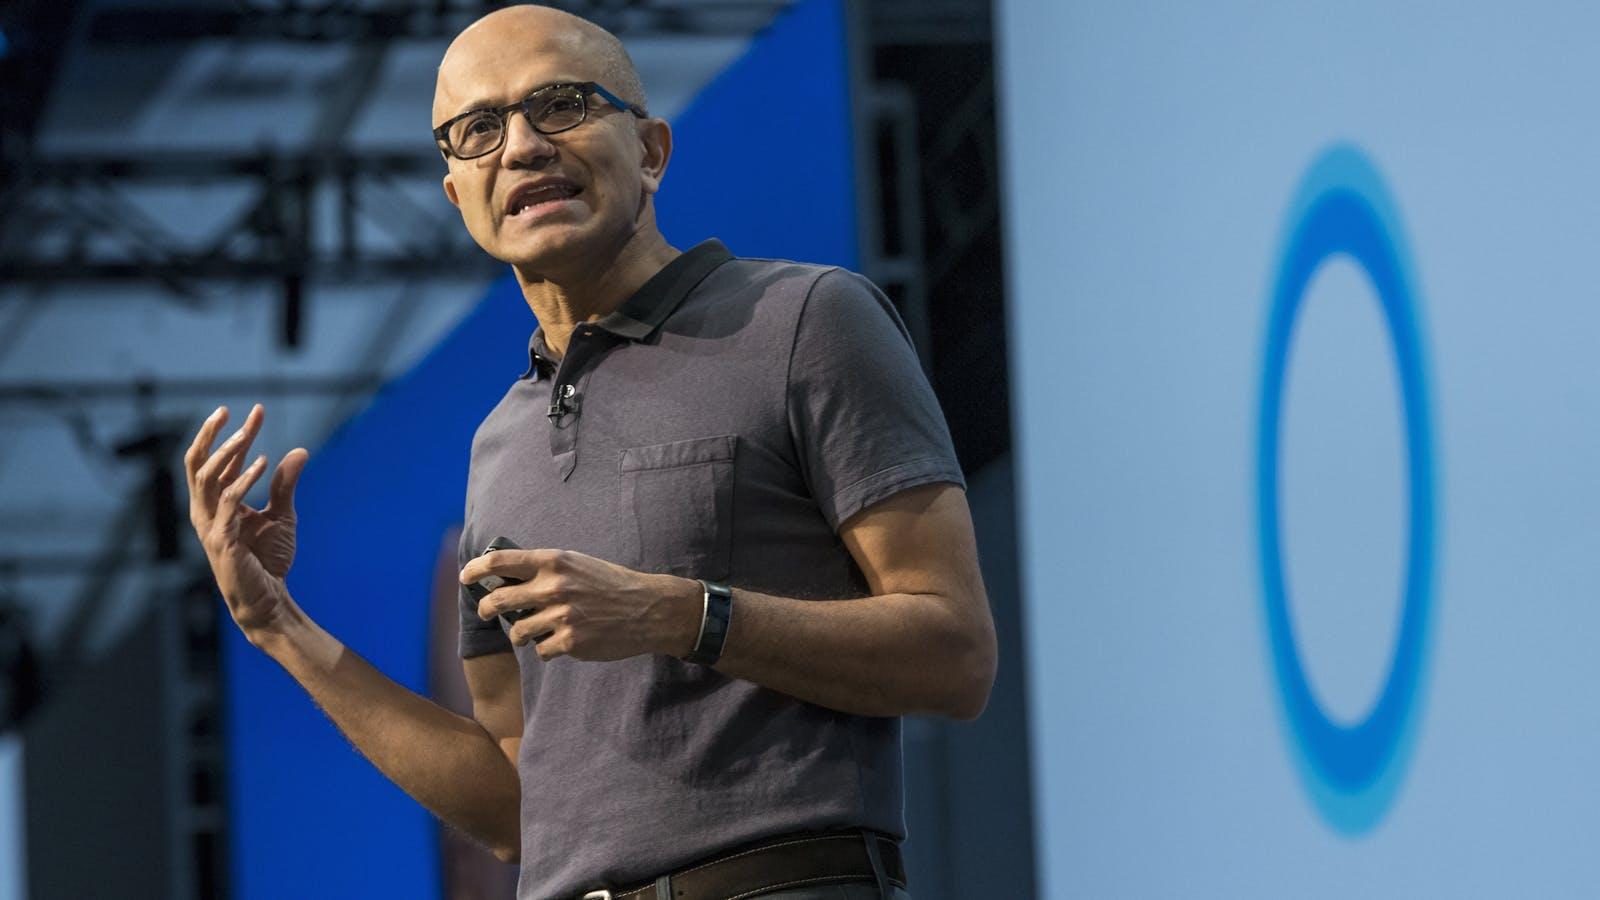 Satya Nadella. Photo by Bloomberg. Other executive photos by Microsoft.